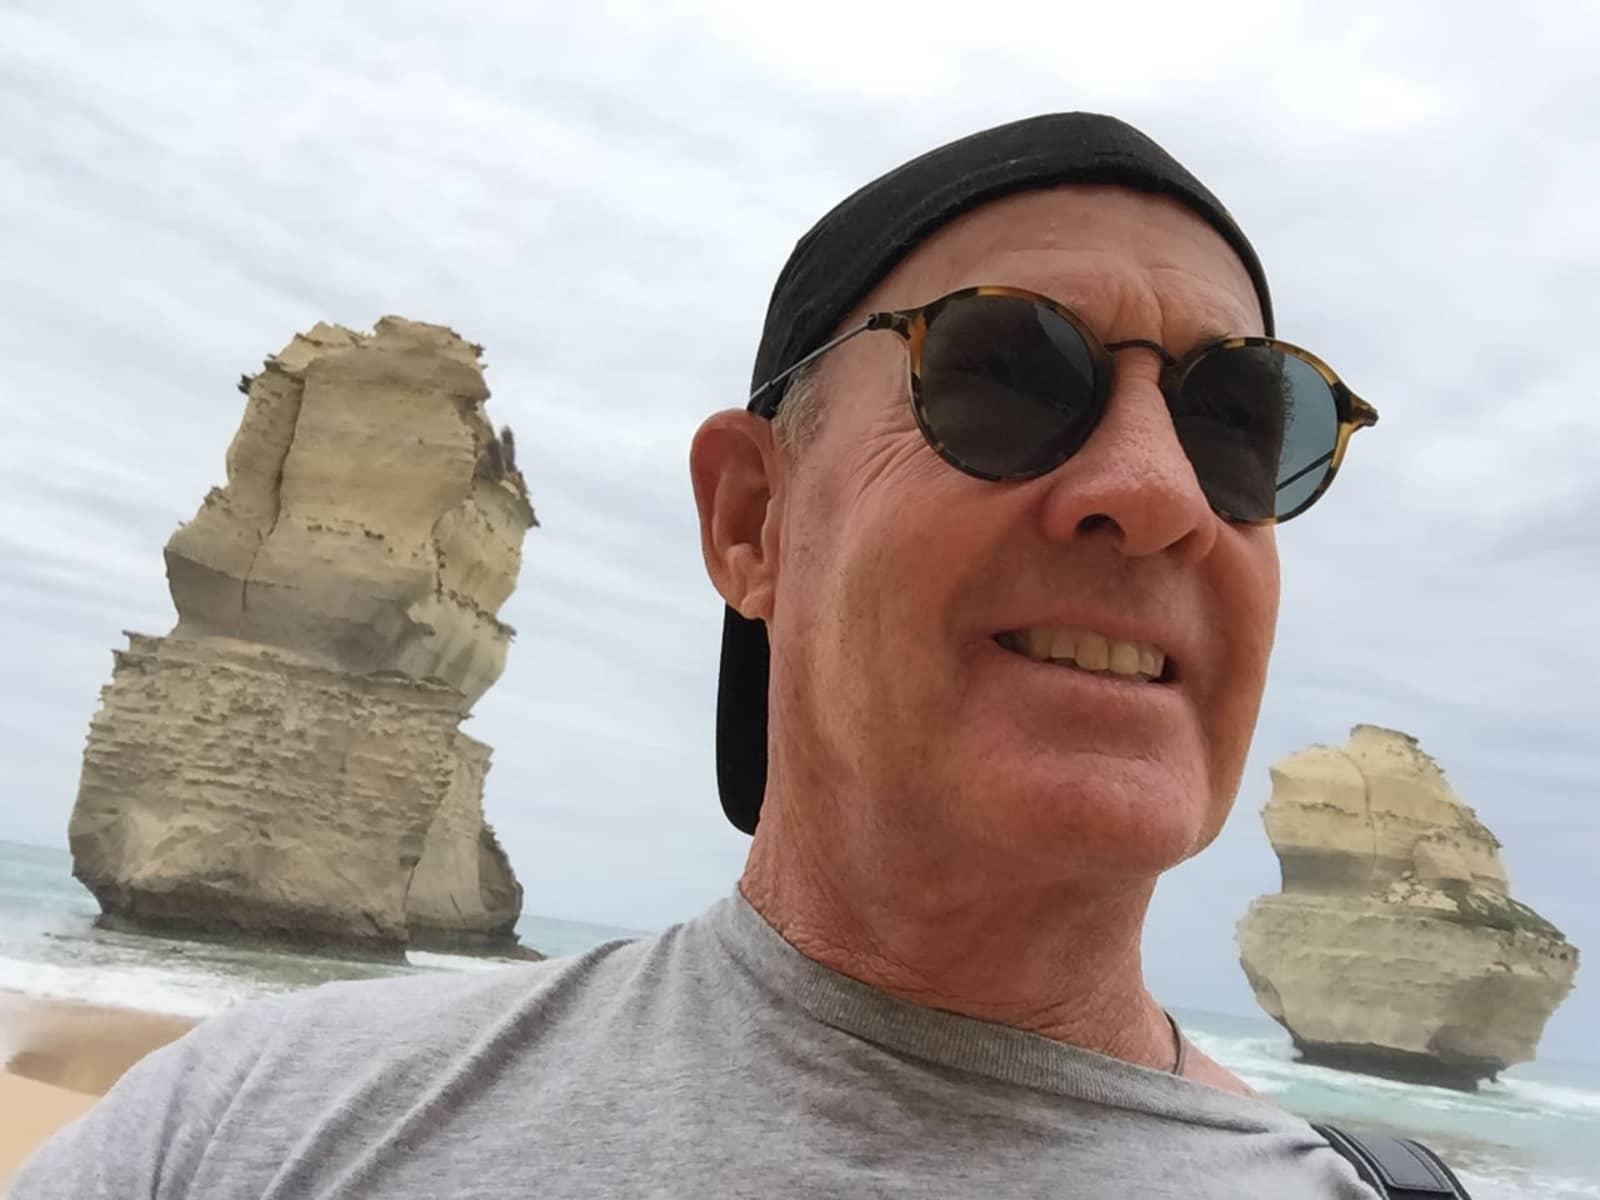 Steve from Casuarina, New South Wales, Australia